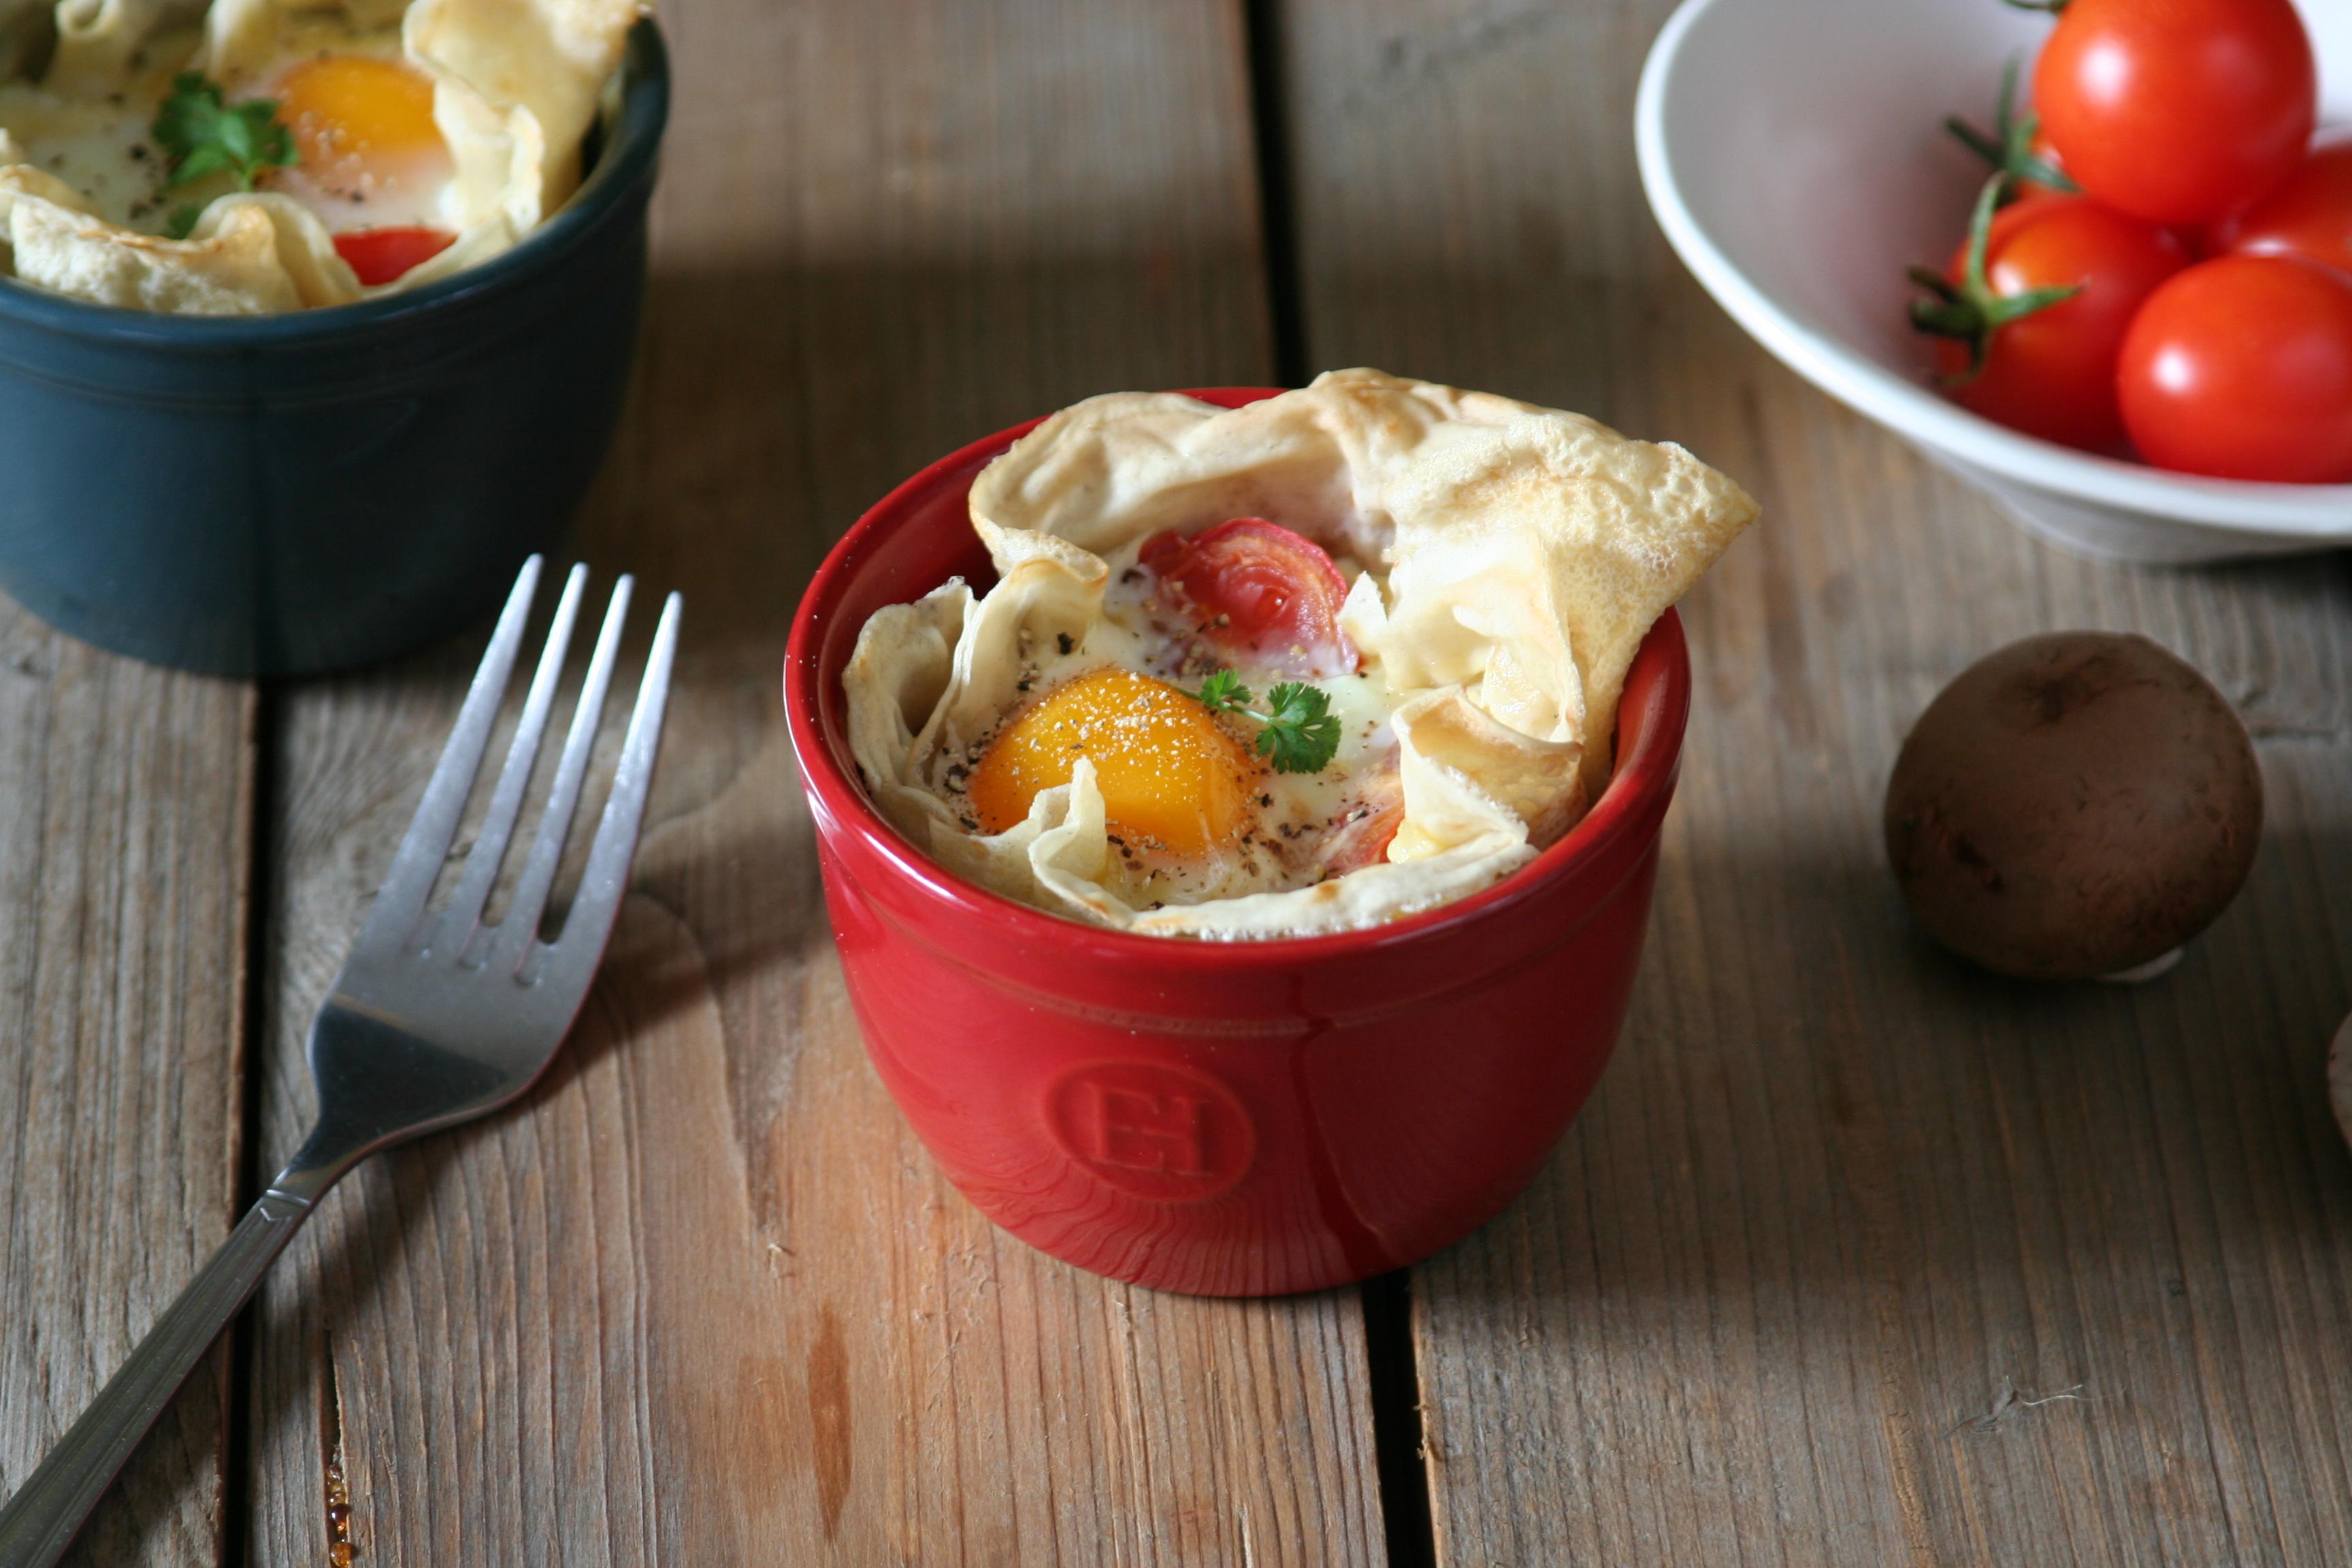 Vejce zapečené v palačince s kozím sýrem a žampiony